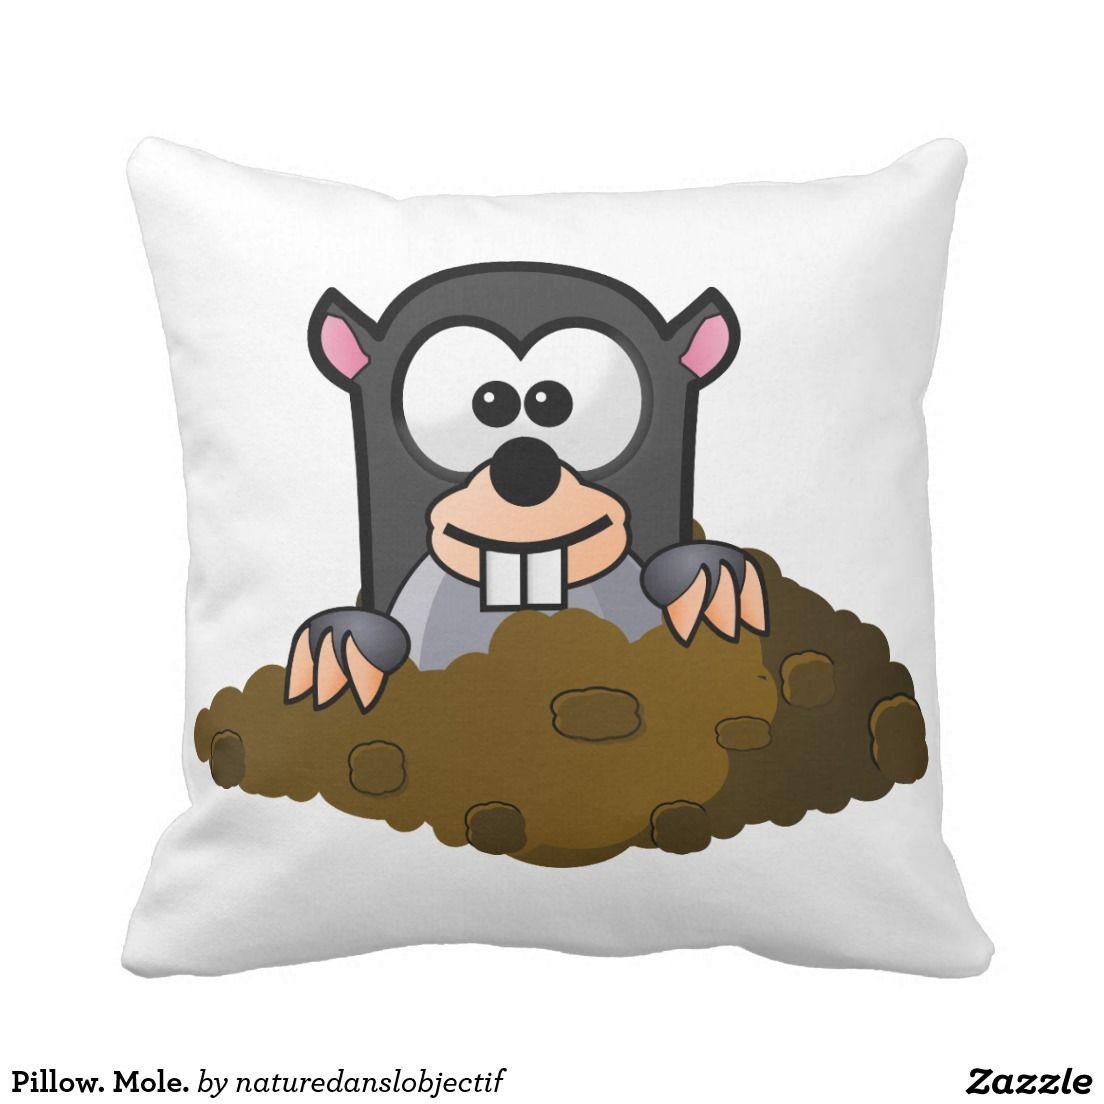 Pillow Mole